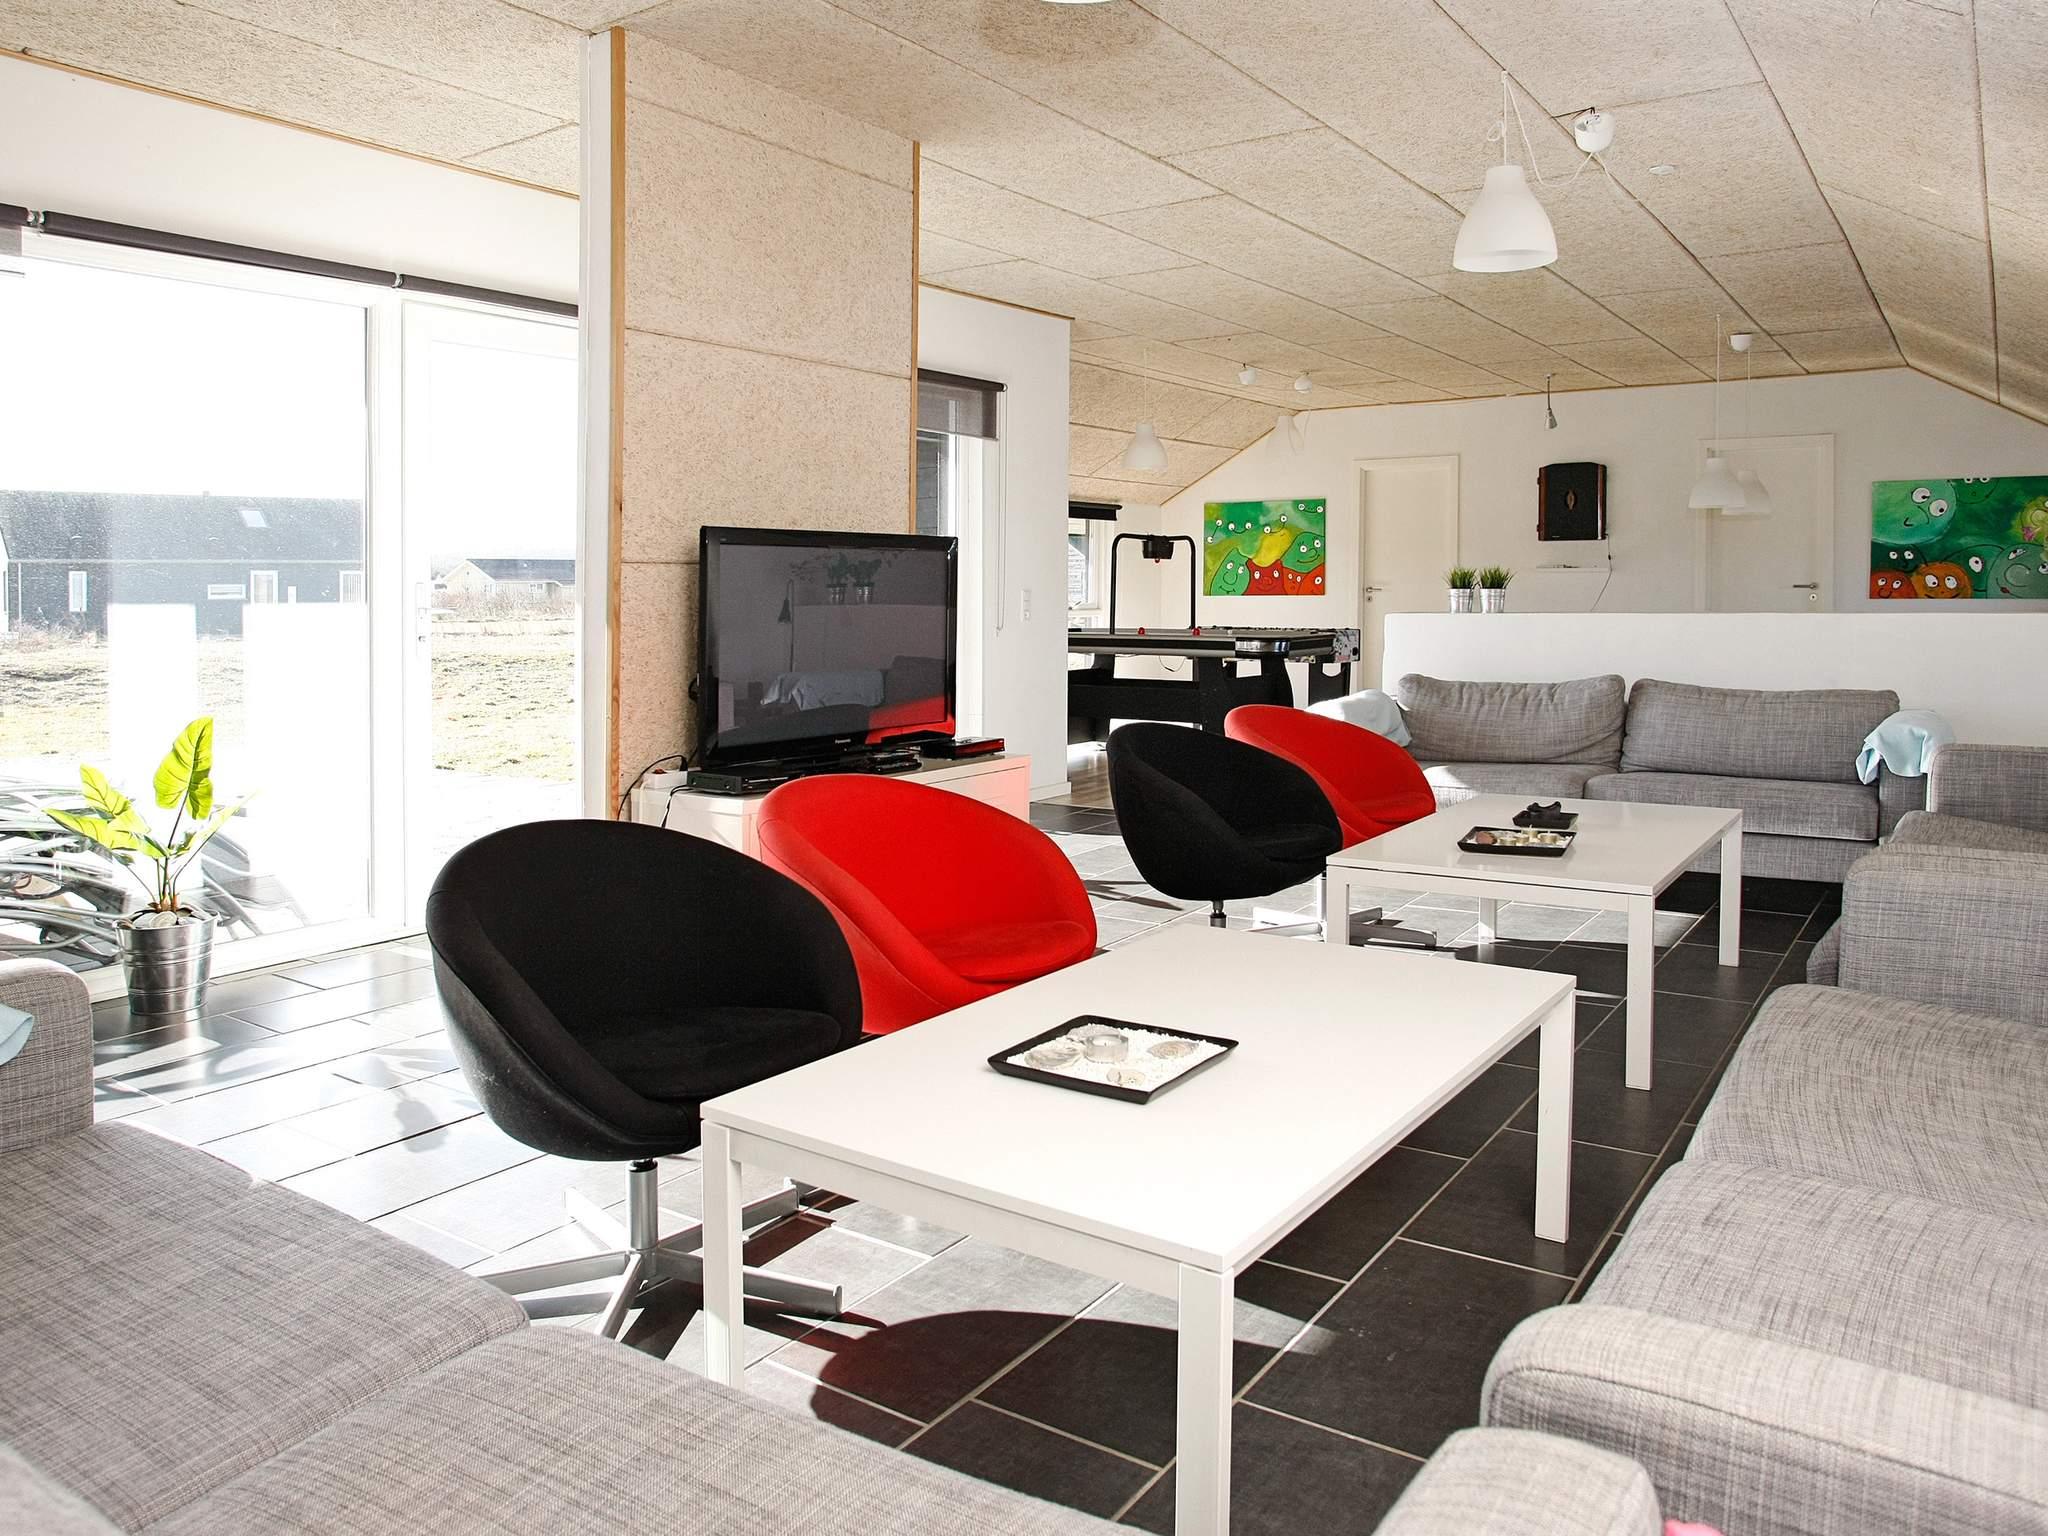 Ferienhaus Tranum Strand (424921), Tranum Enge, , Nordwestjütland, Dänemark, Bild 3